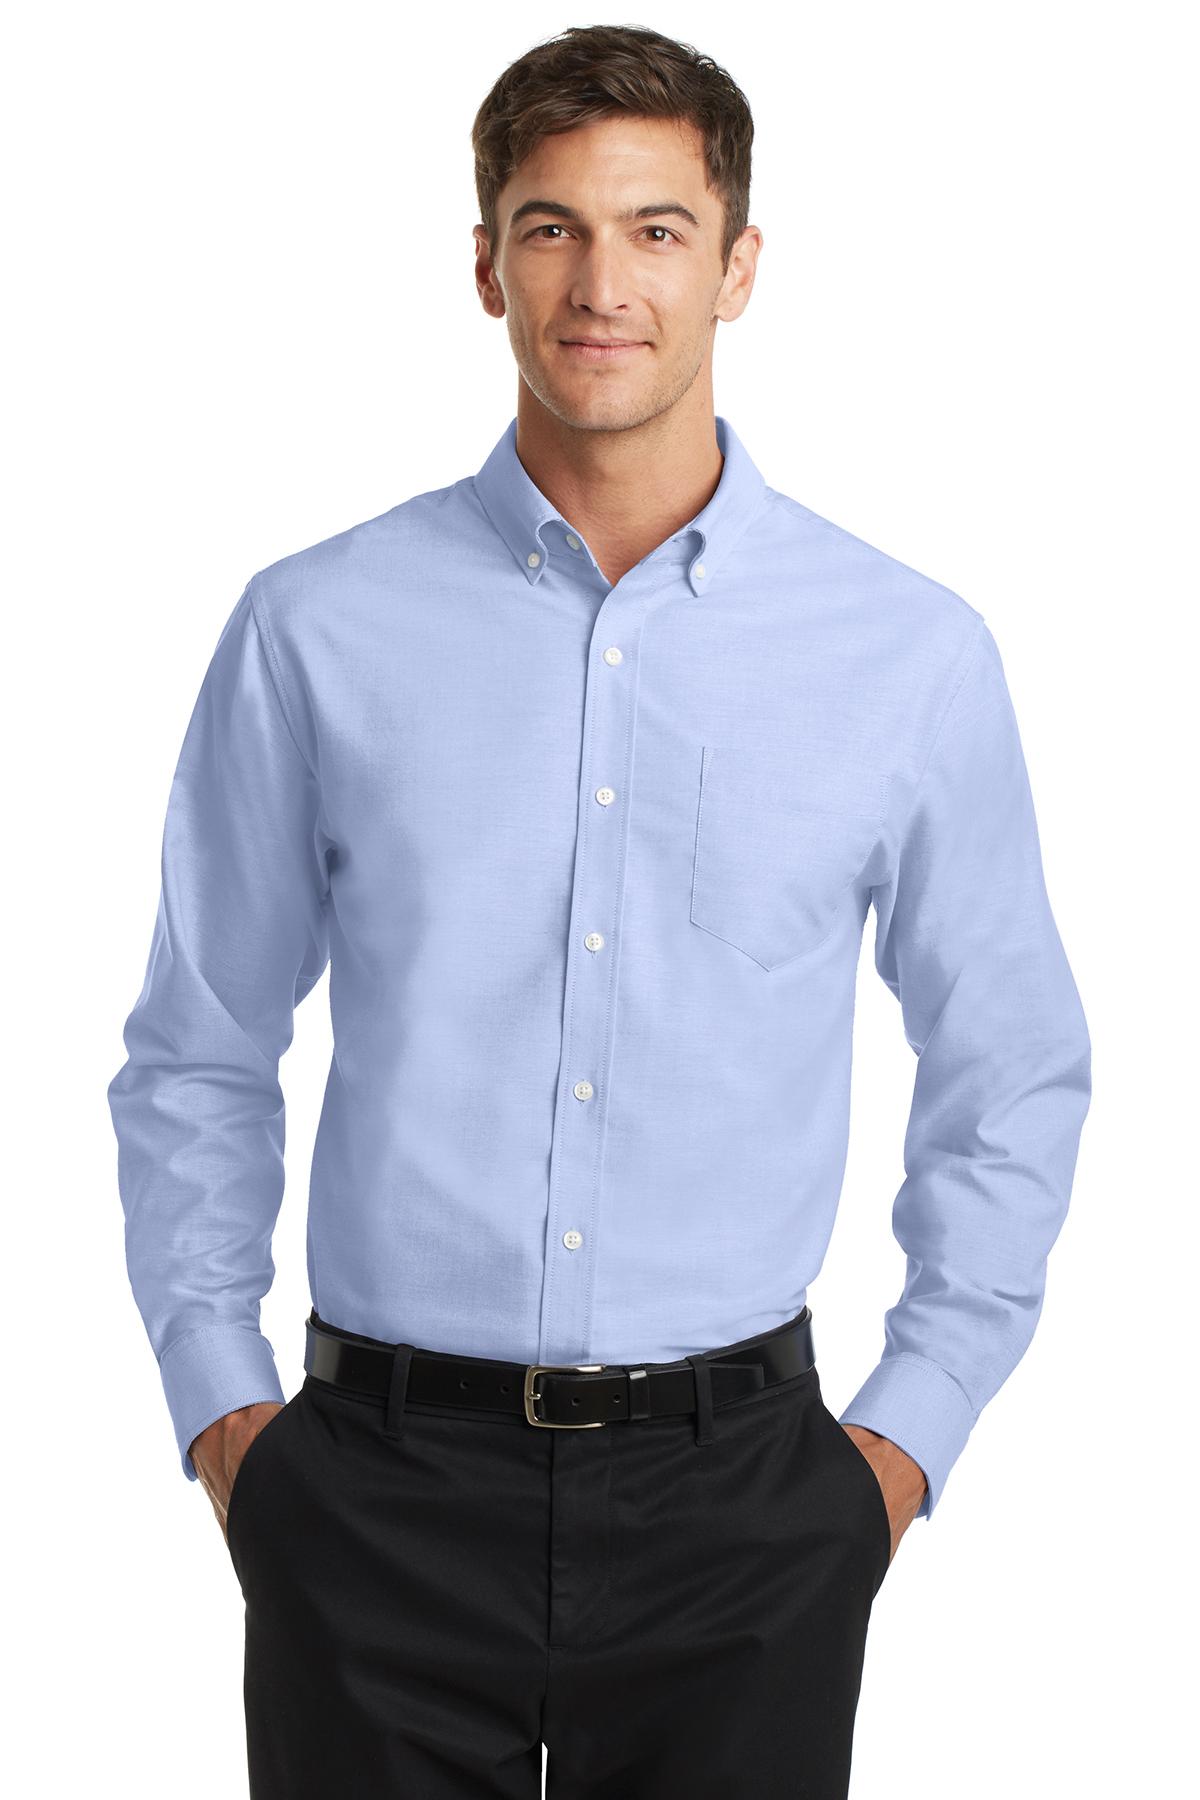 7603d10397b071 Port Authority® SuperPro™ Oxford Shirt | Oxfords | Woven Shirts ...